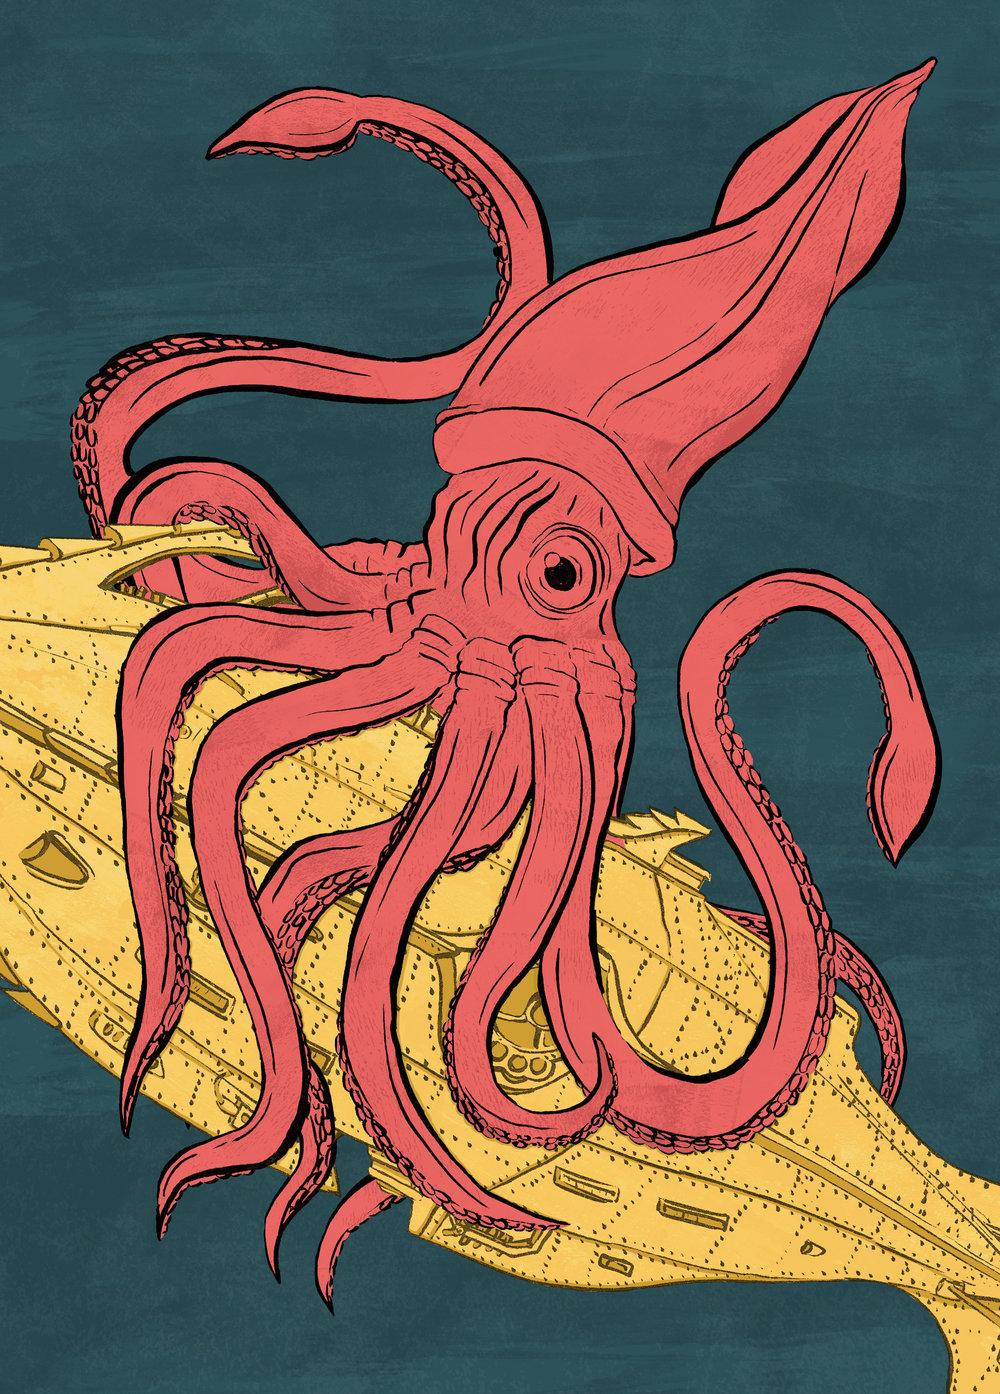 Kraken attacks... - This illustration is my representation of the fabled 'Kraken'attacking the Nautilus.